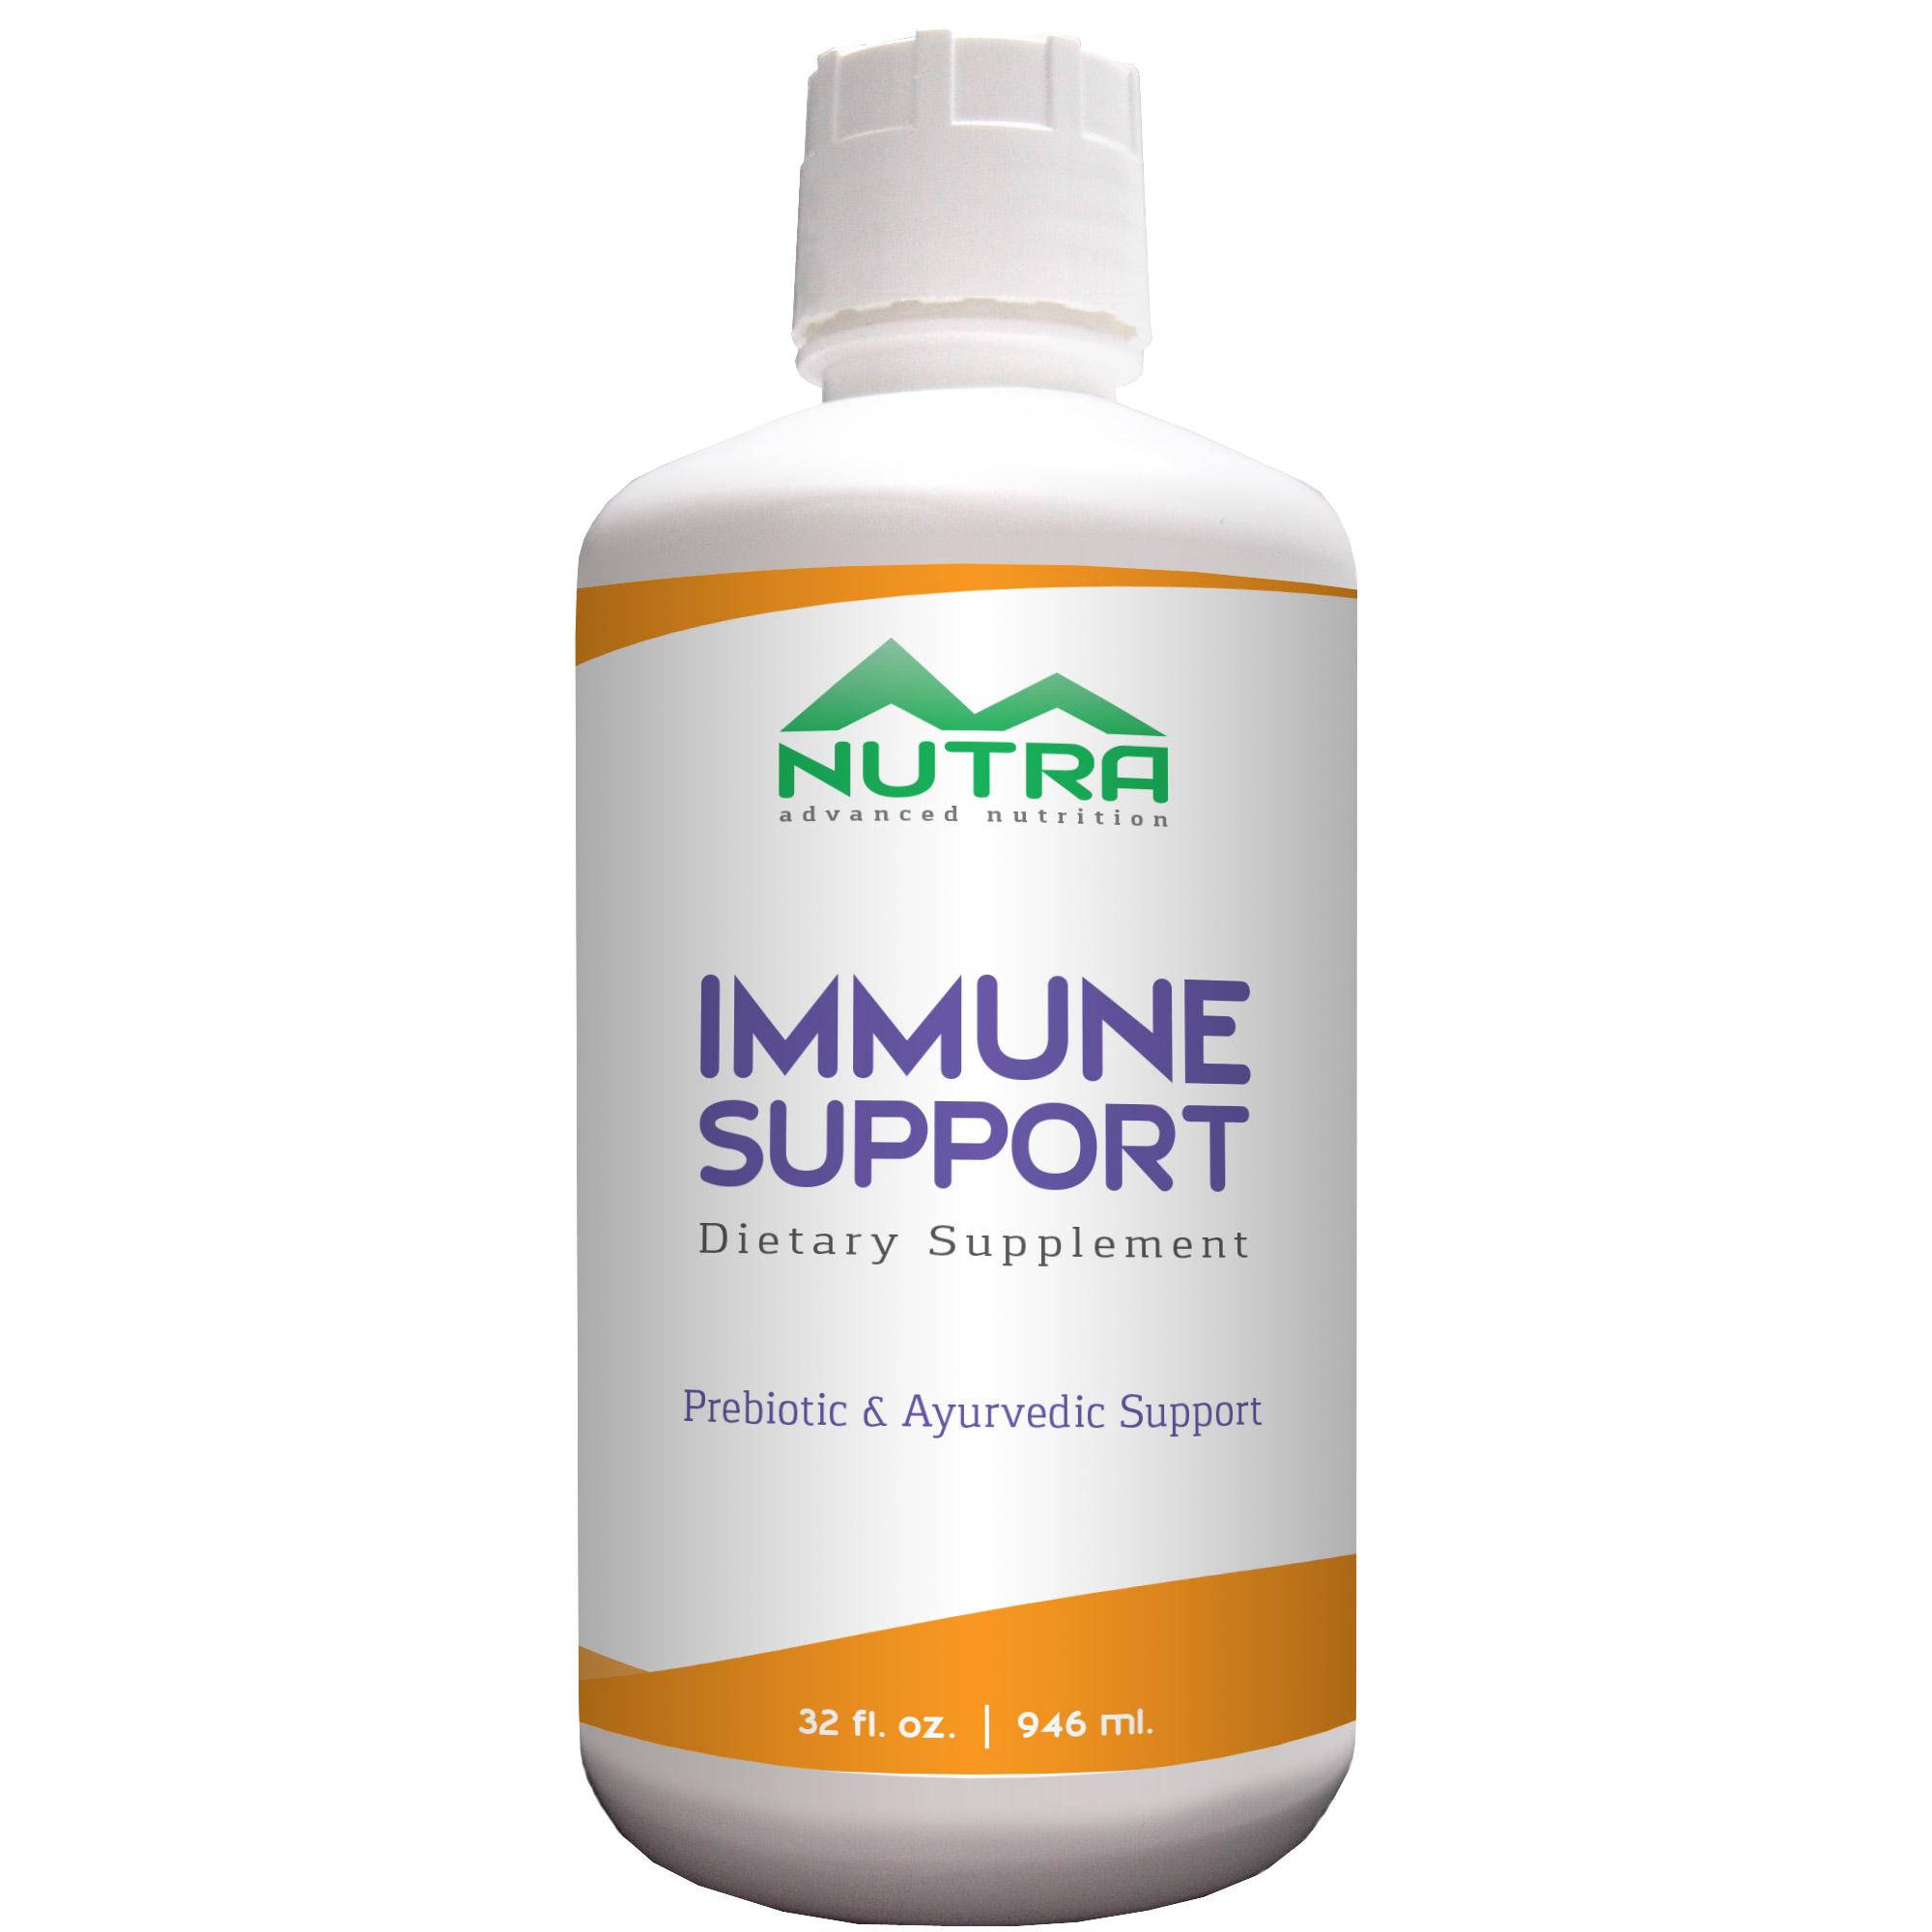 White Label Supplements Liquid Vitamins | Private Label